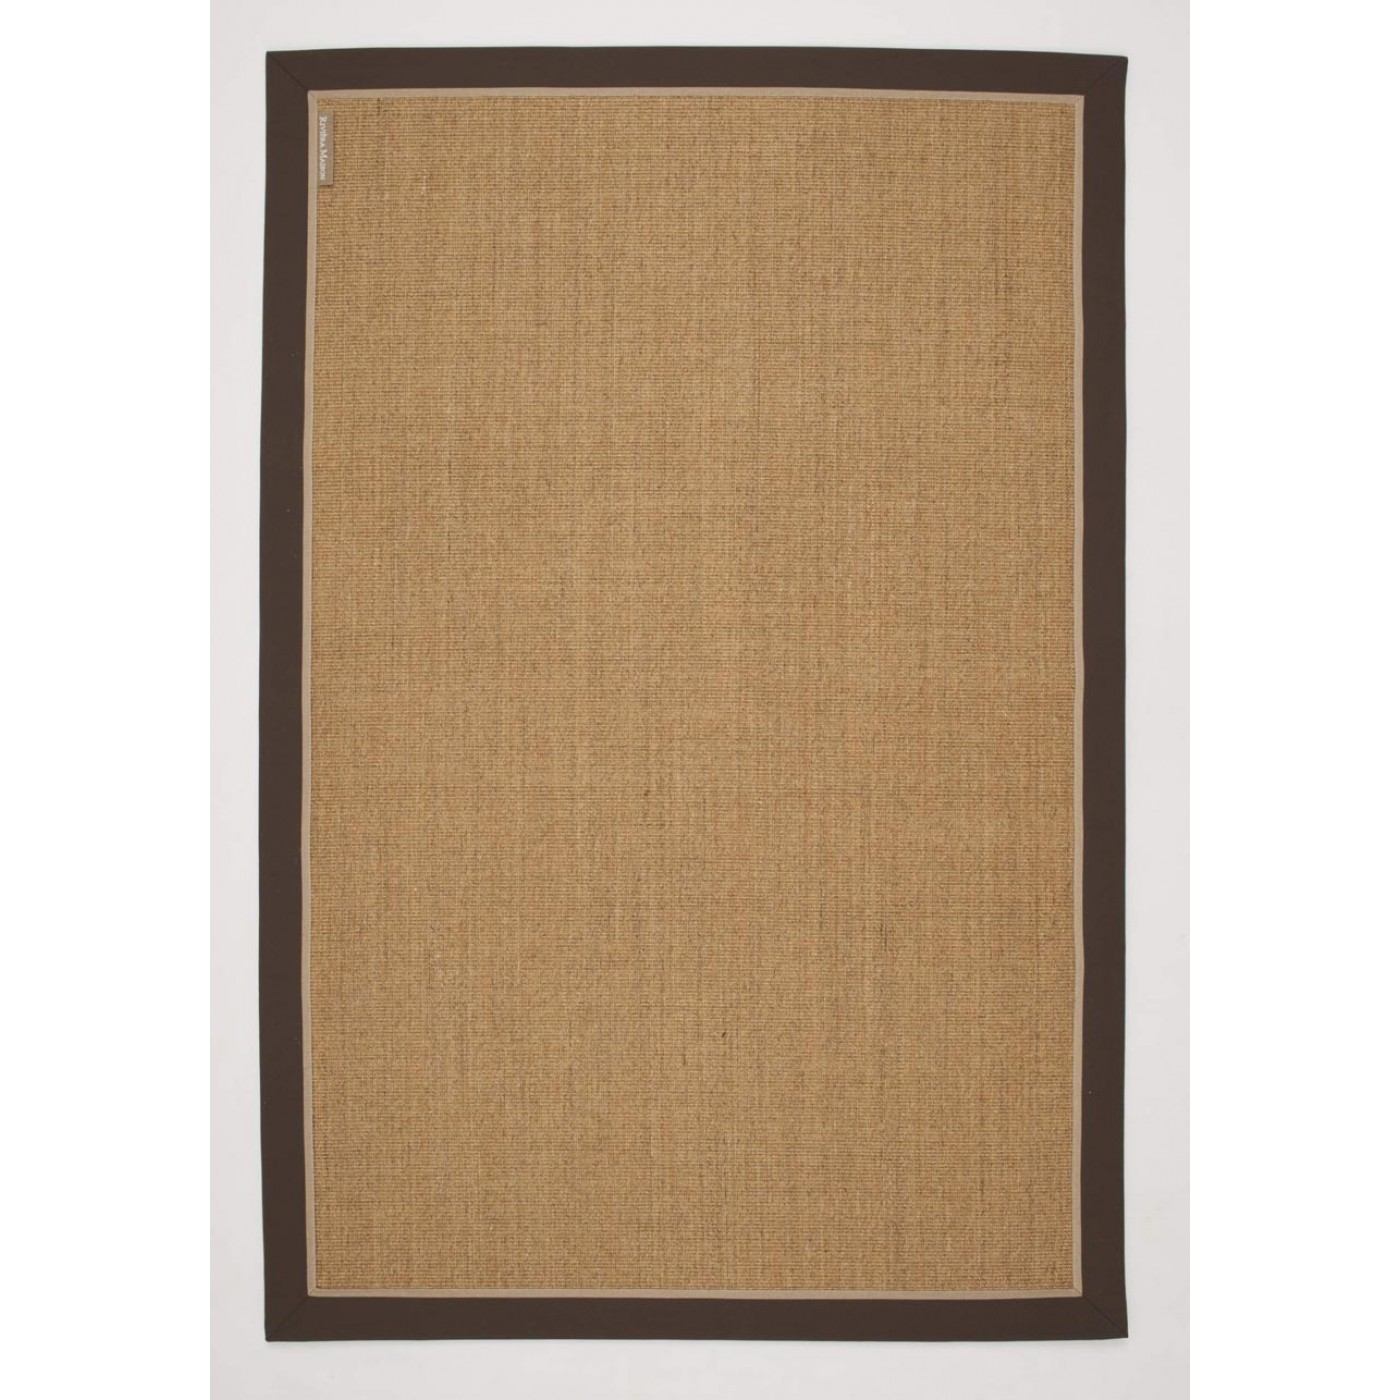 Edgartown Carpet Riviera Maison 15 RM 18